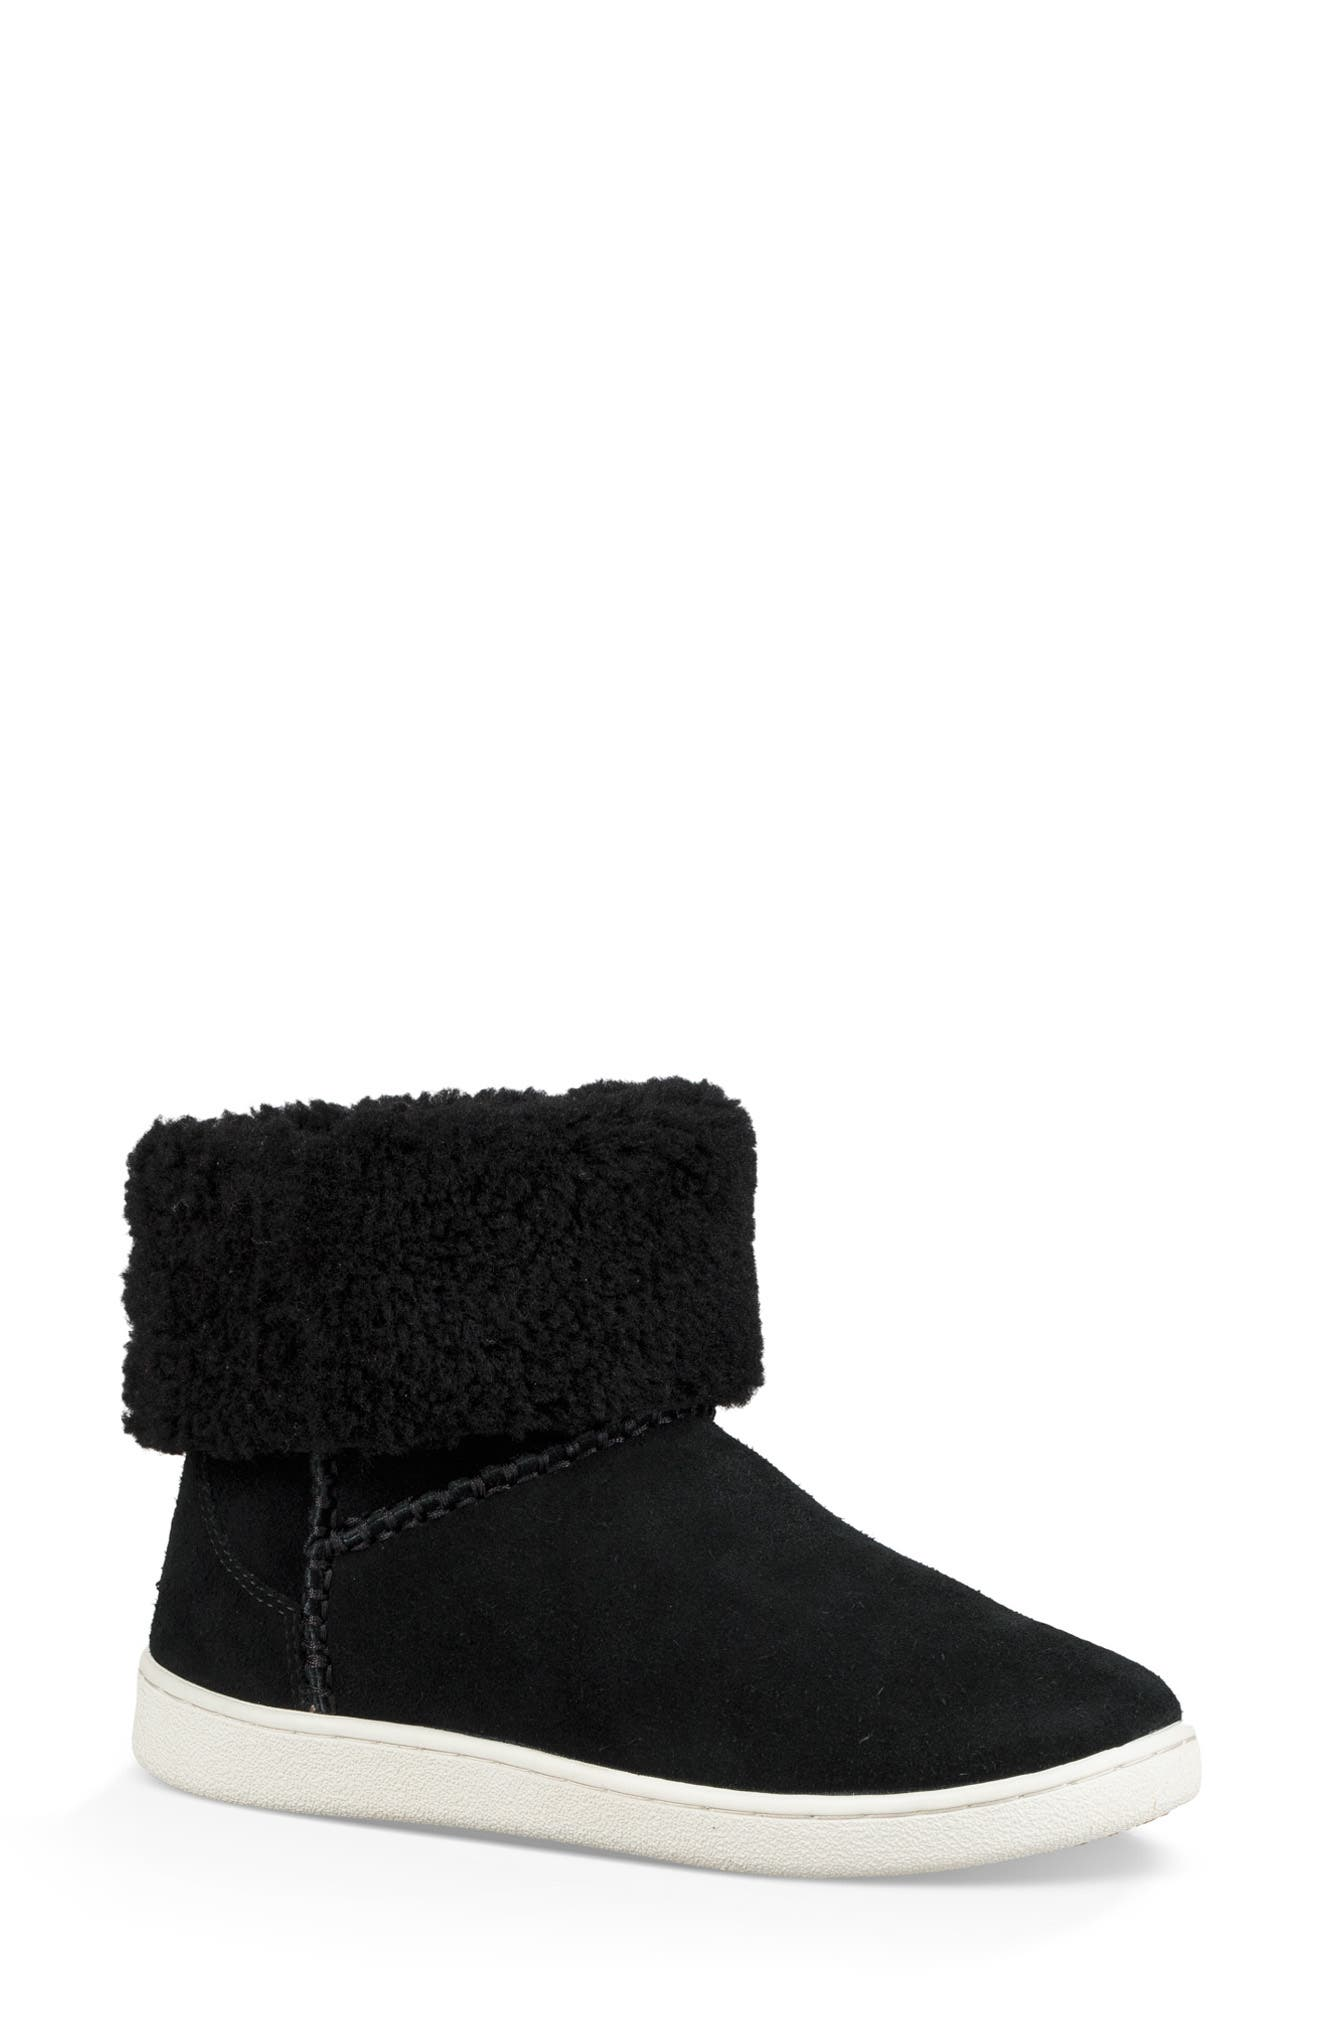 Mika Classic Genuine Shearling Sneaker,                         Main,                         color, BLACK